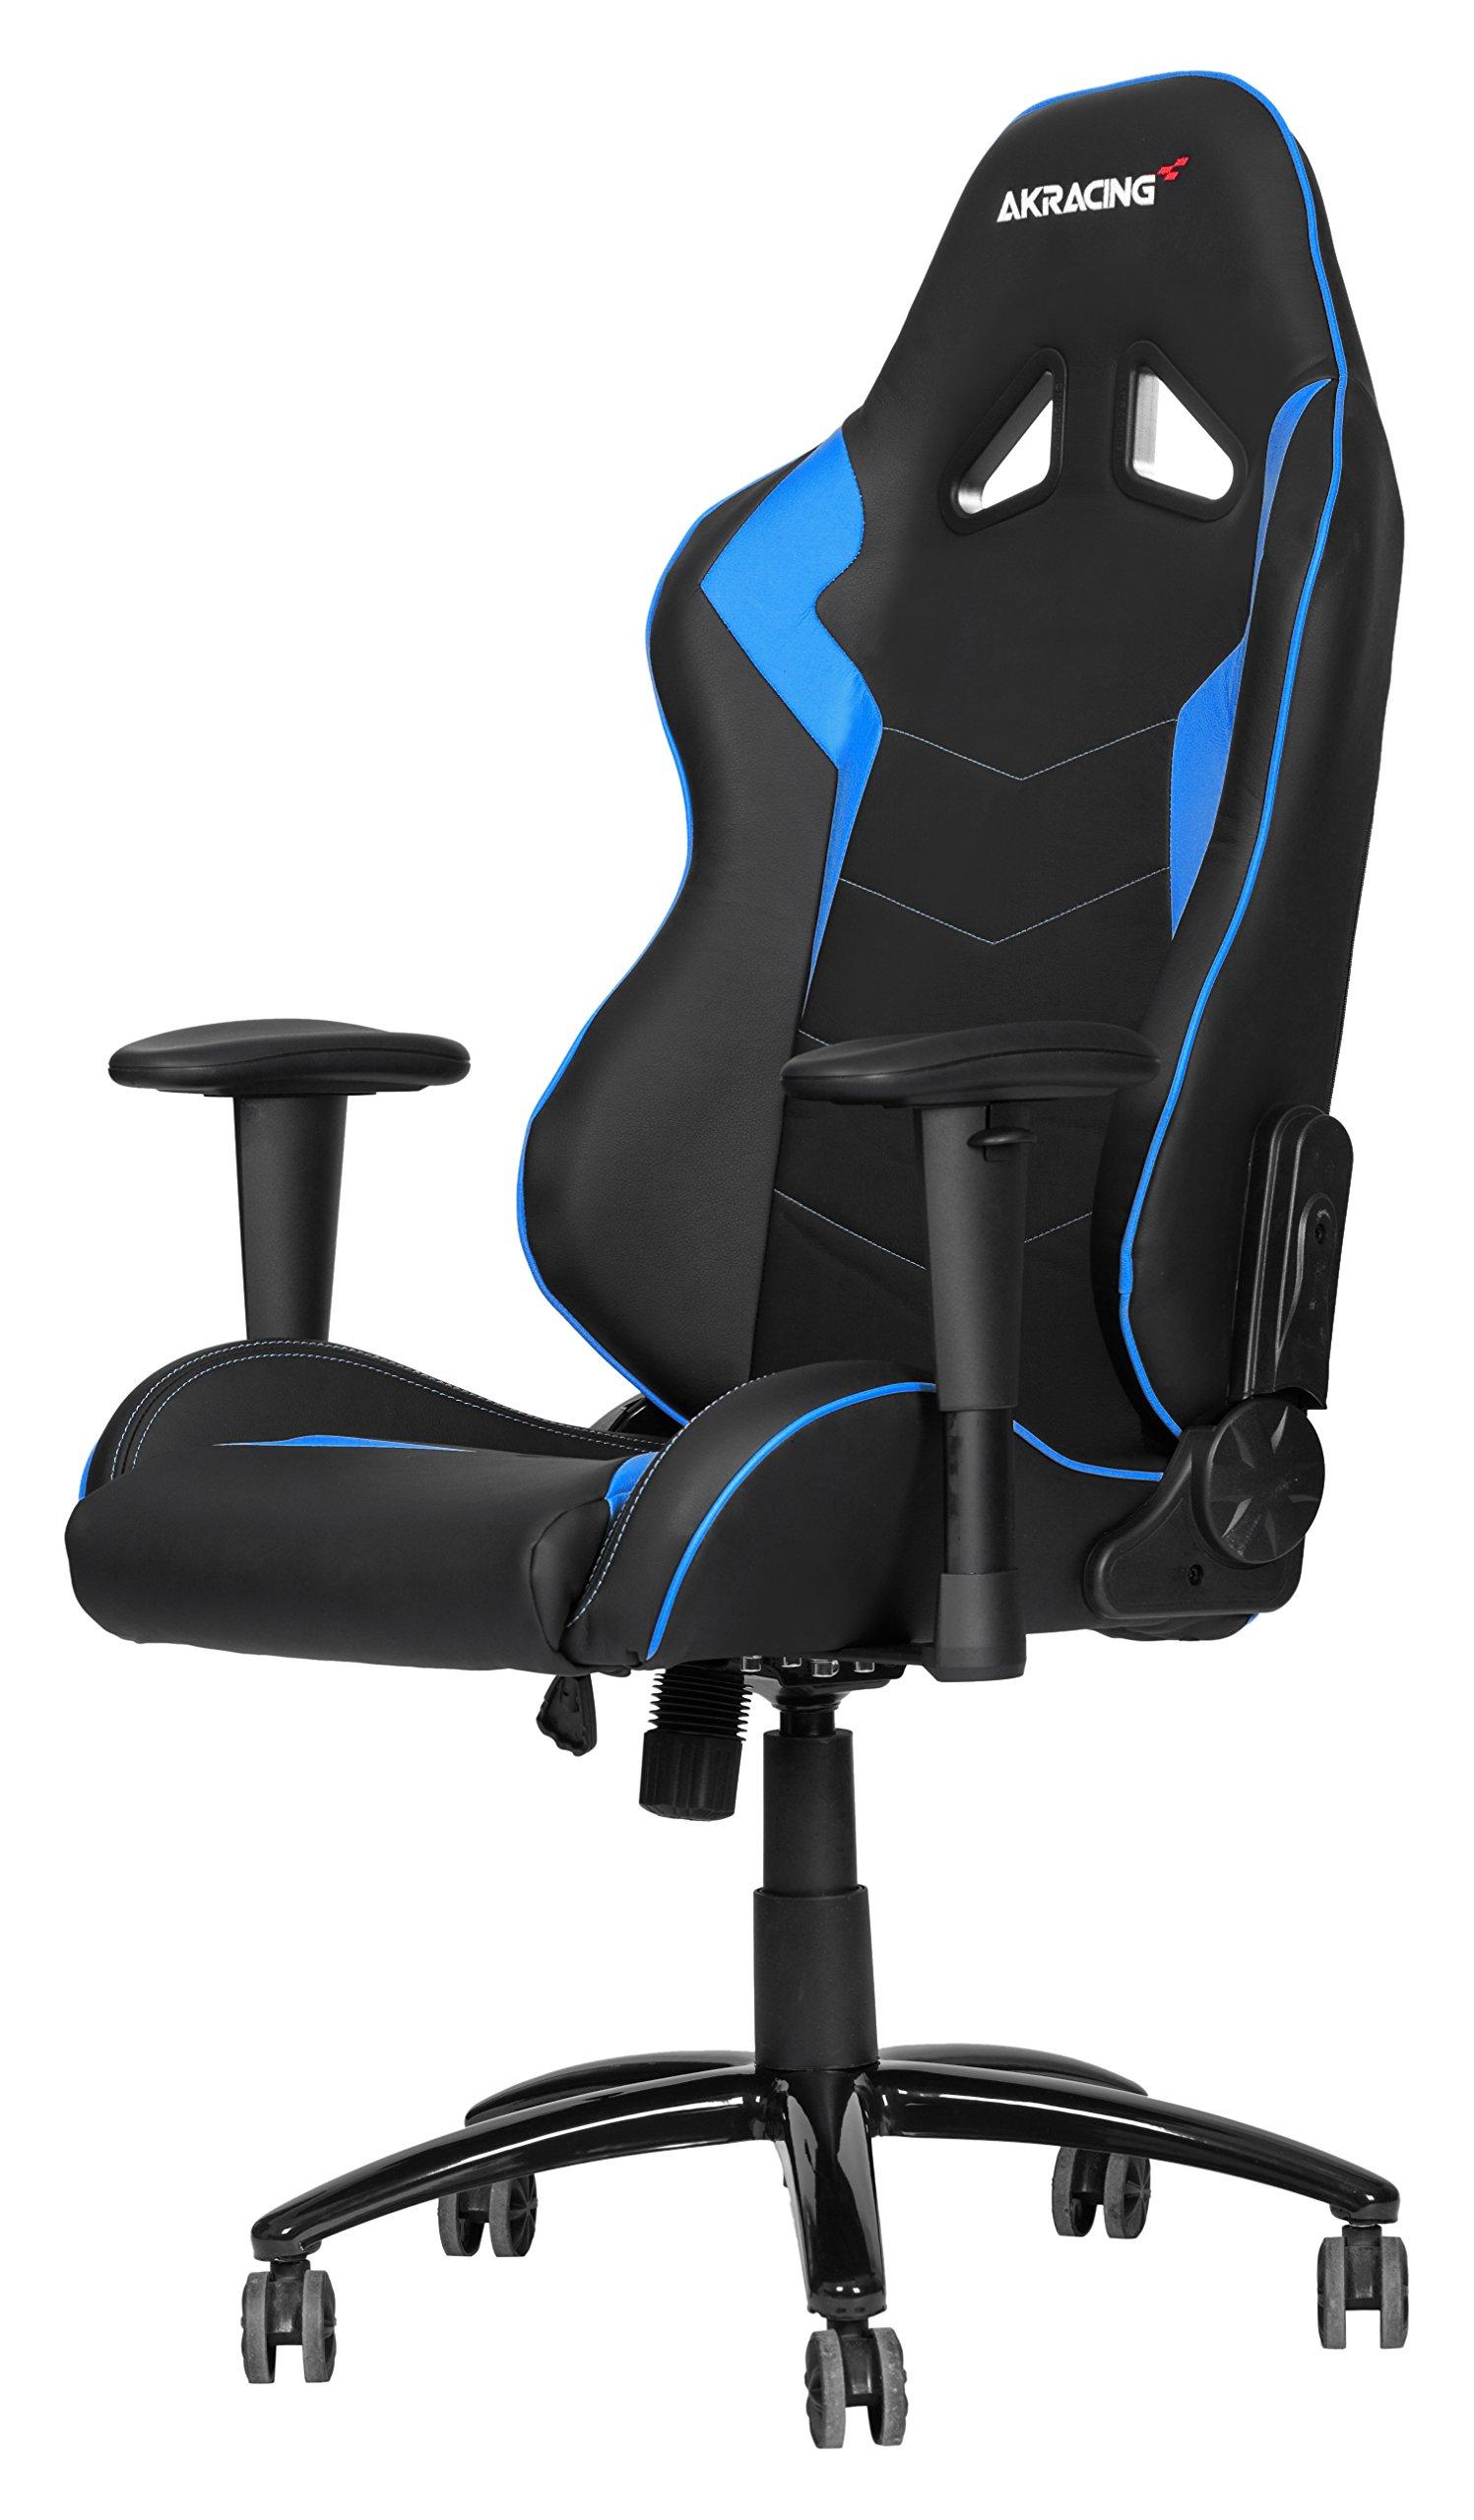 AKRacing Octane – AK-OCTANE-BL – Silla Gaming, Color Negro/Azul